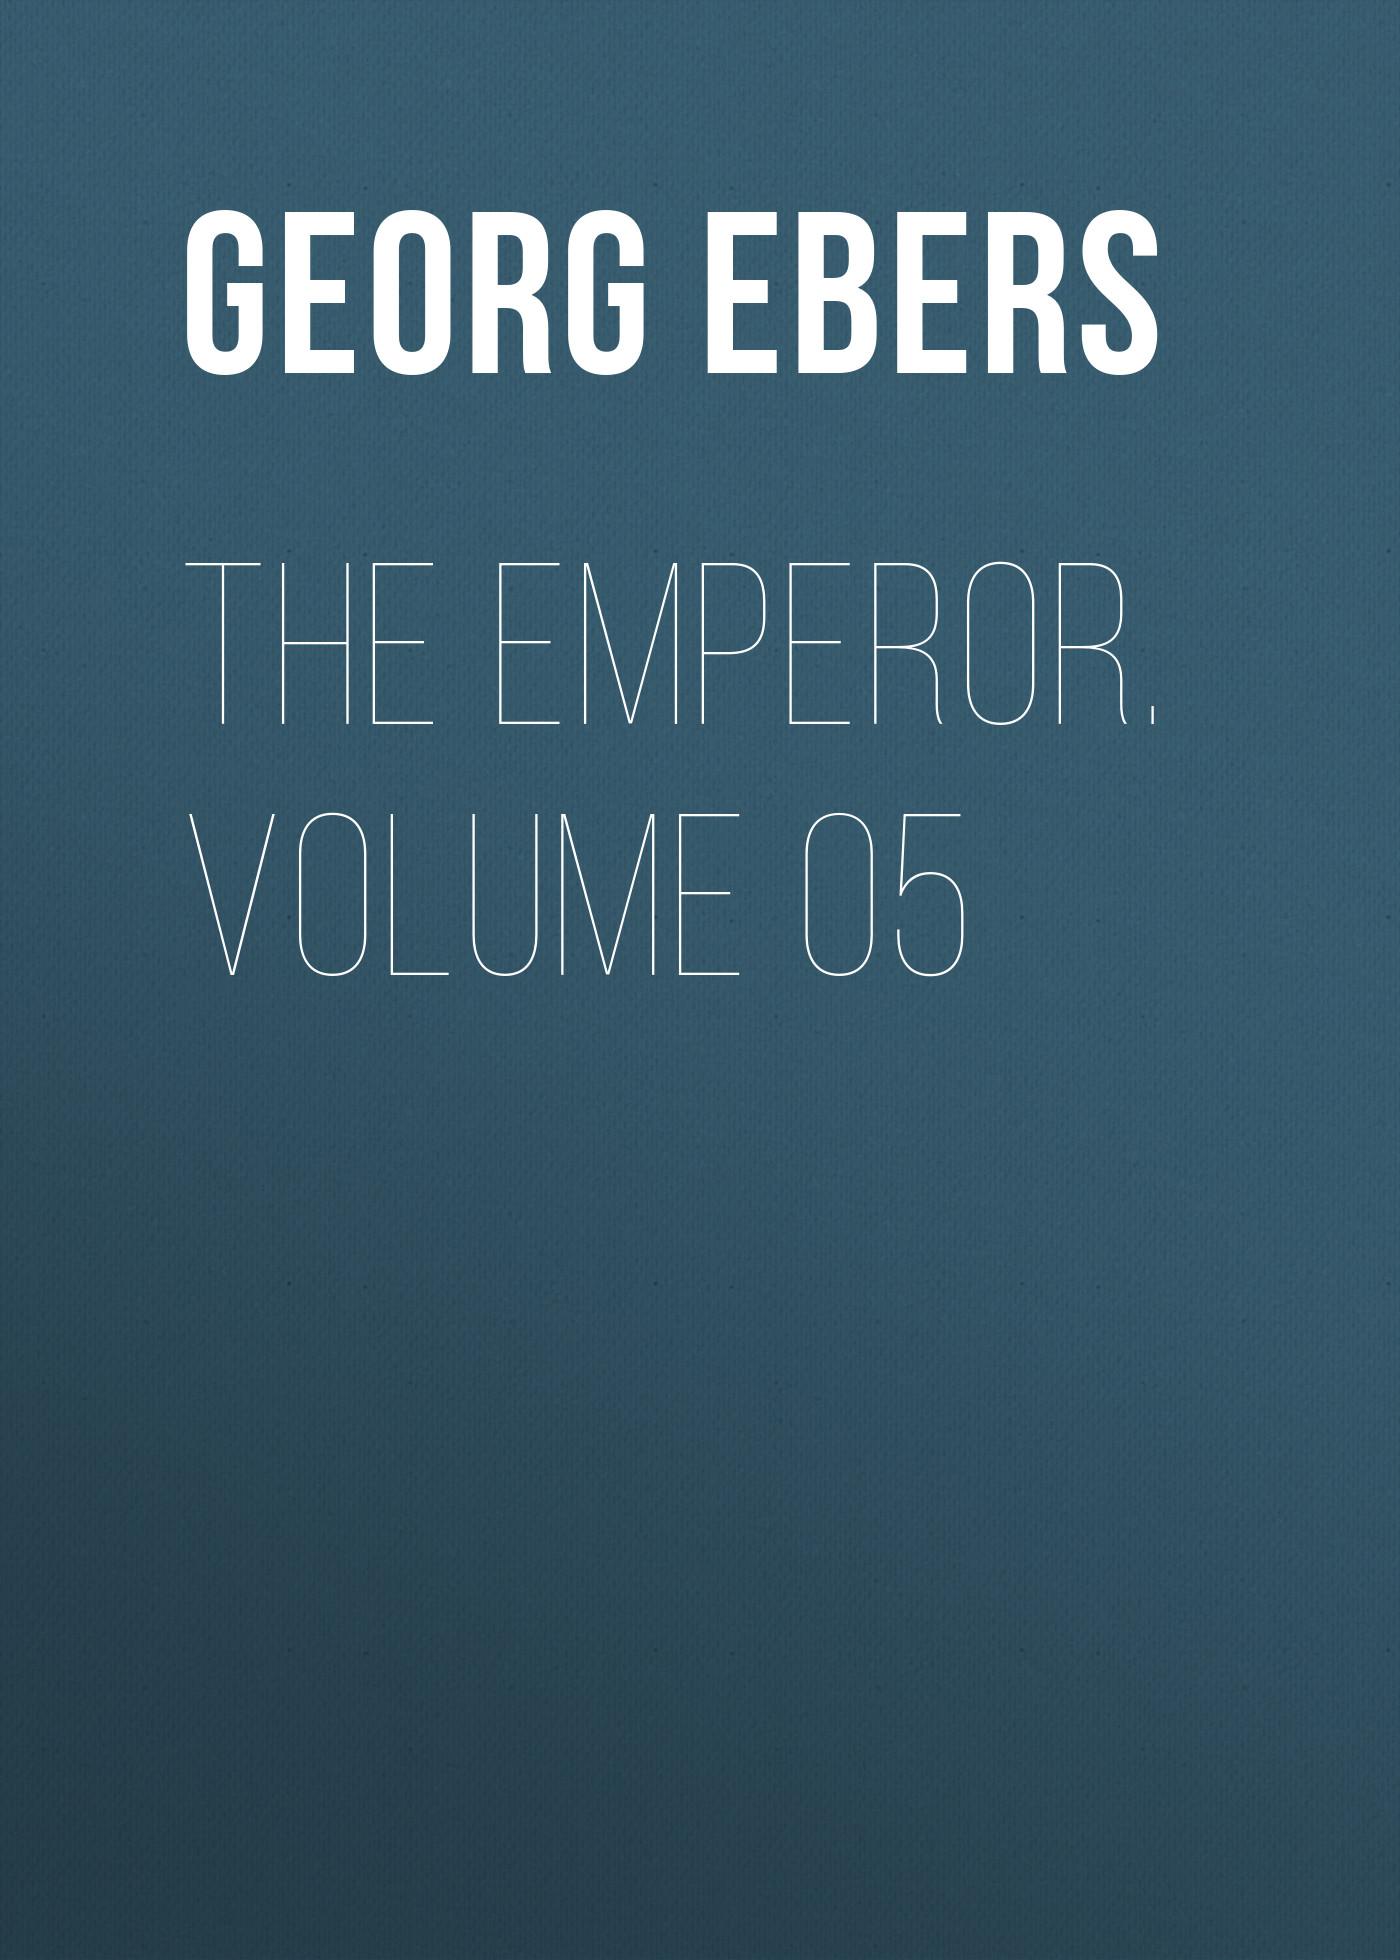 Georg Ebers The Emperor. Volume 05 georg ebers homo sum volume 05